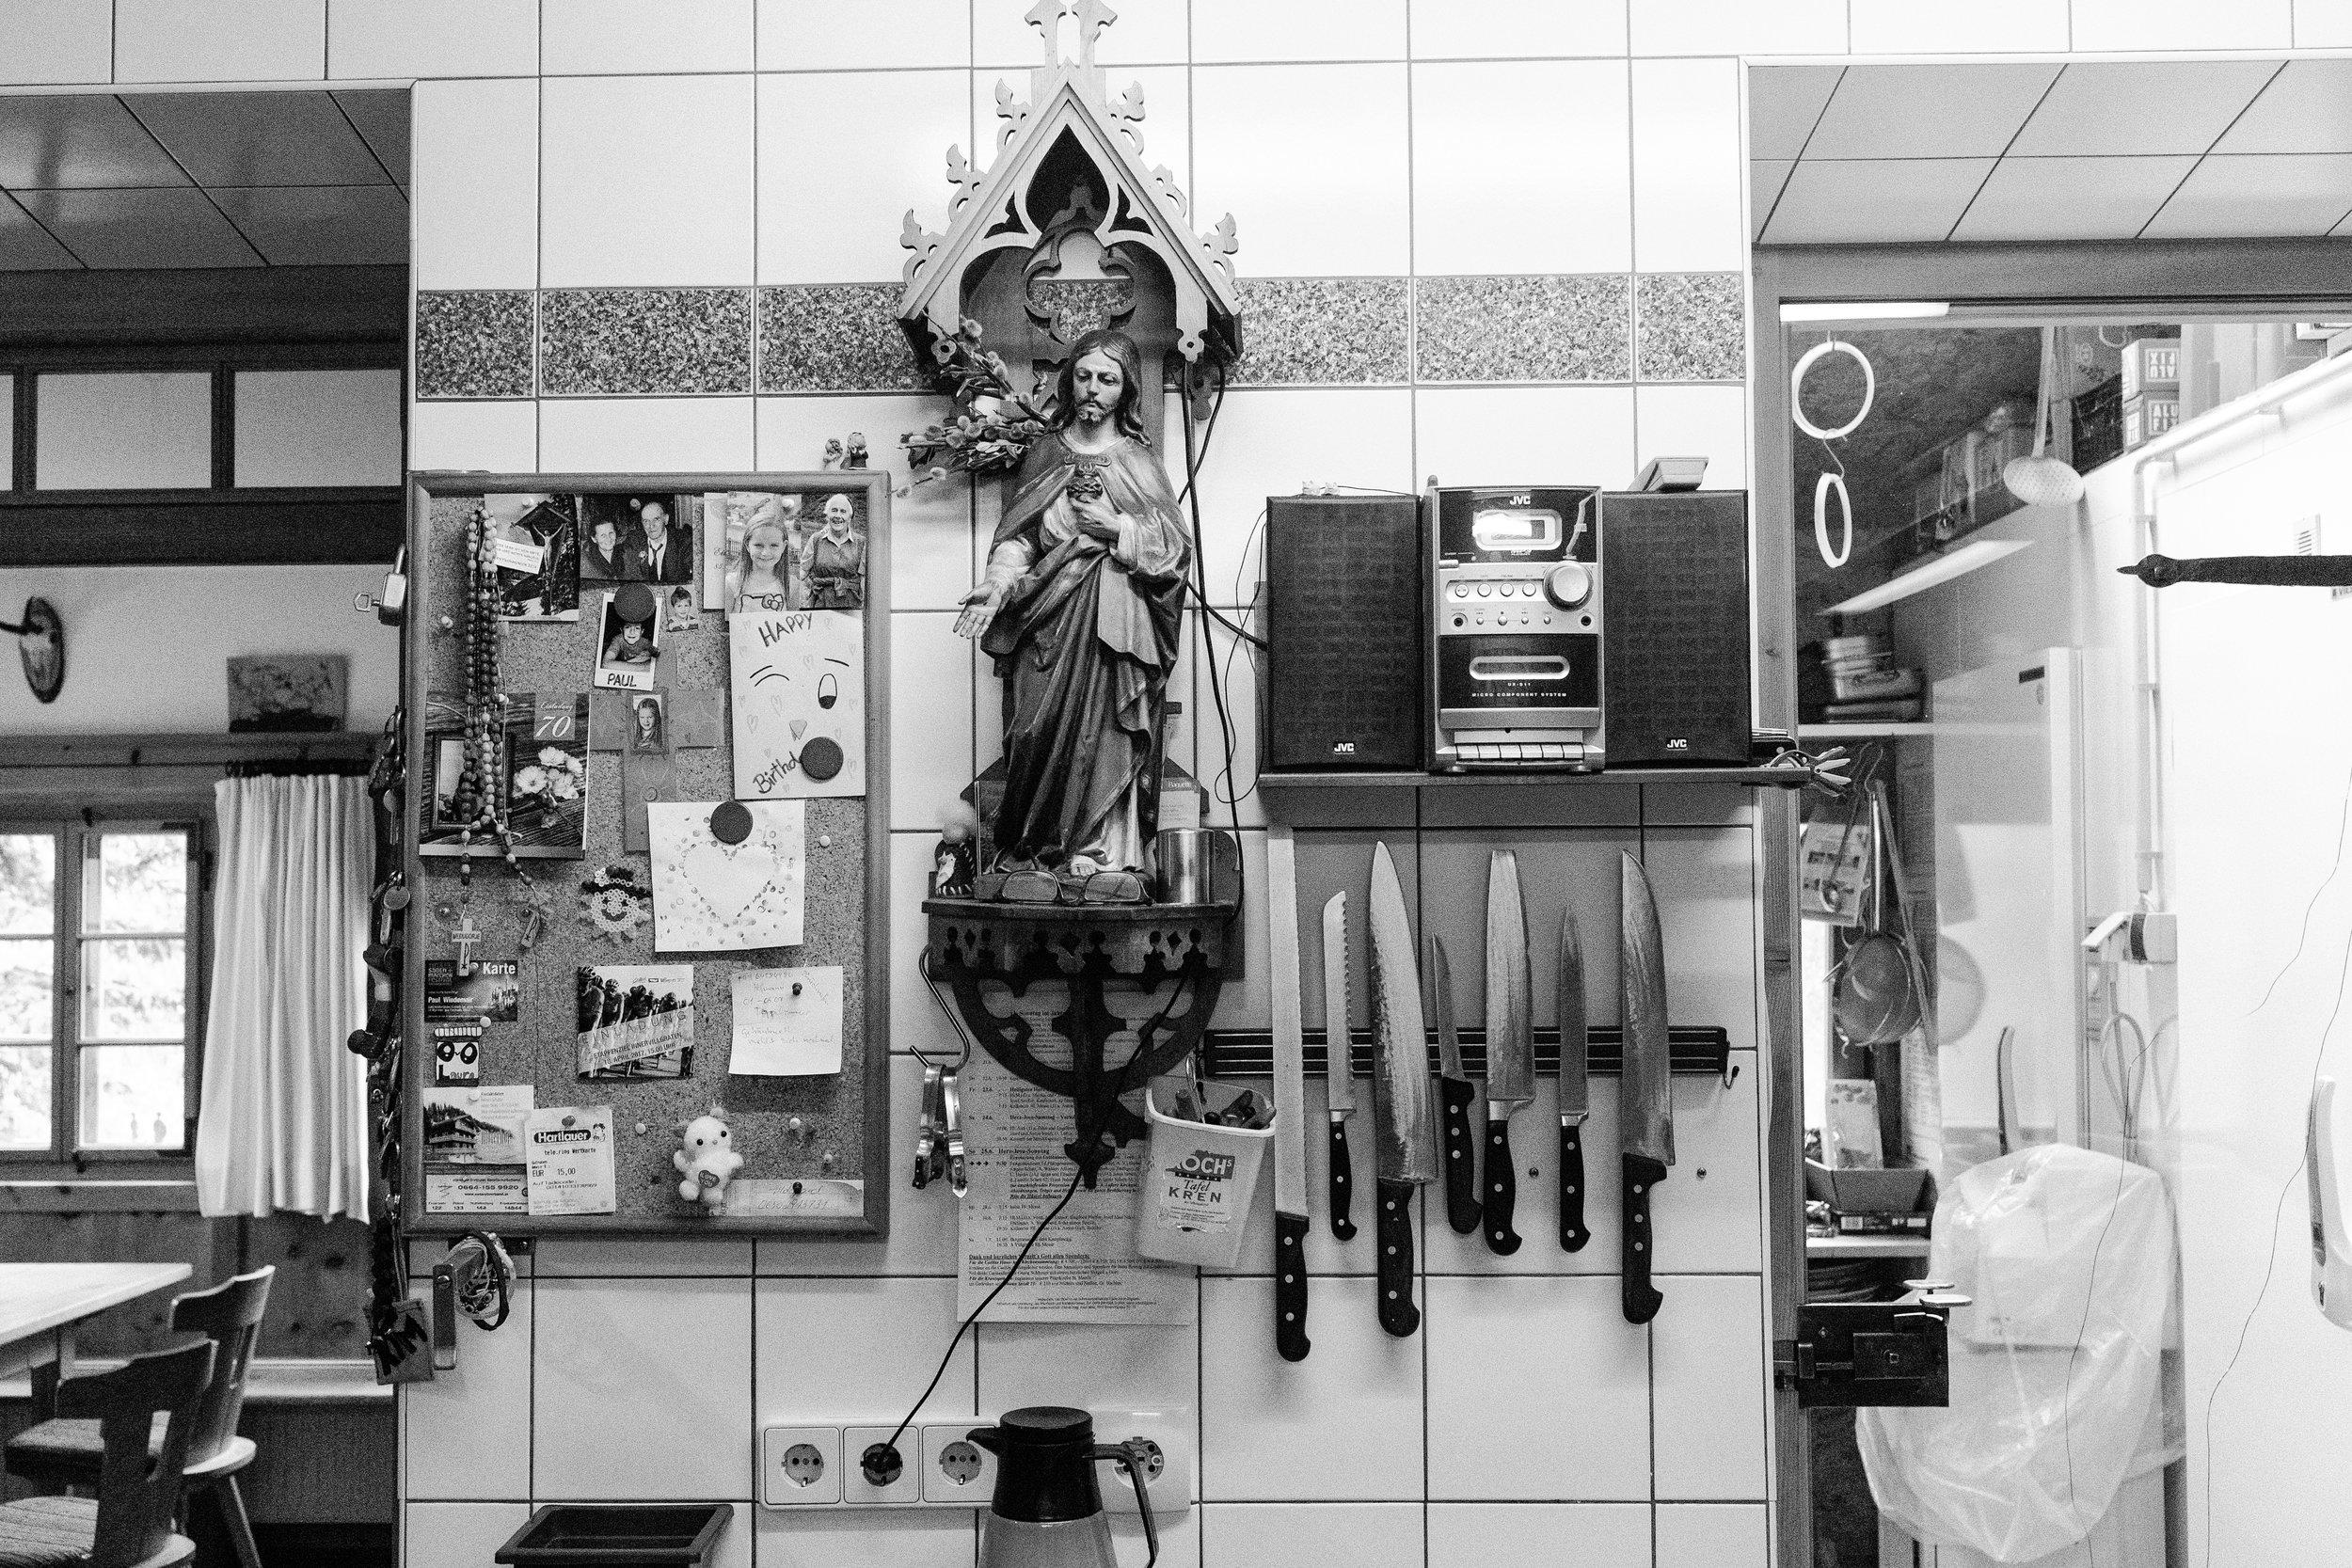 Badl Herrgottswinkel